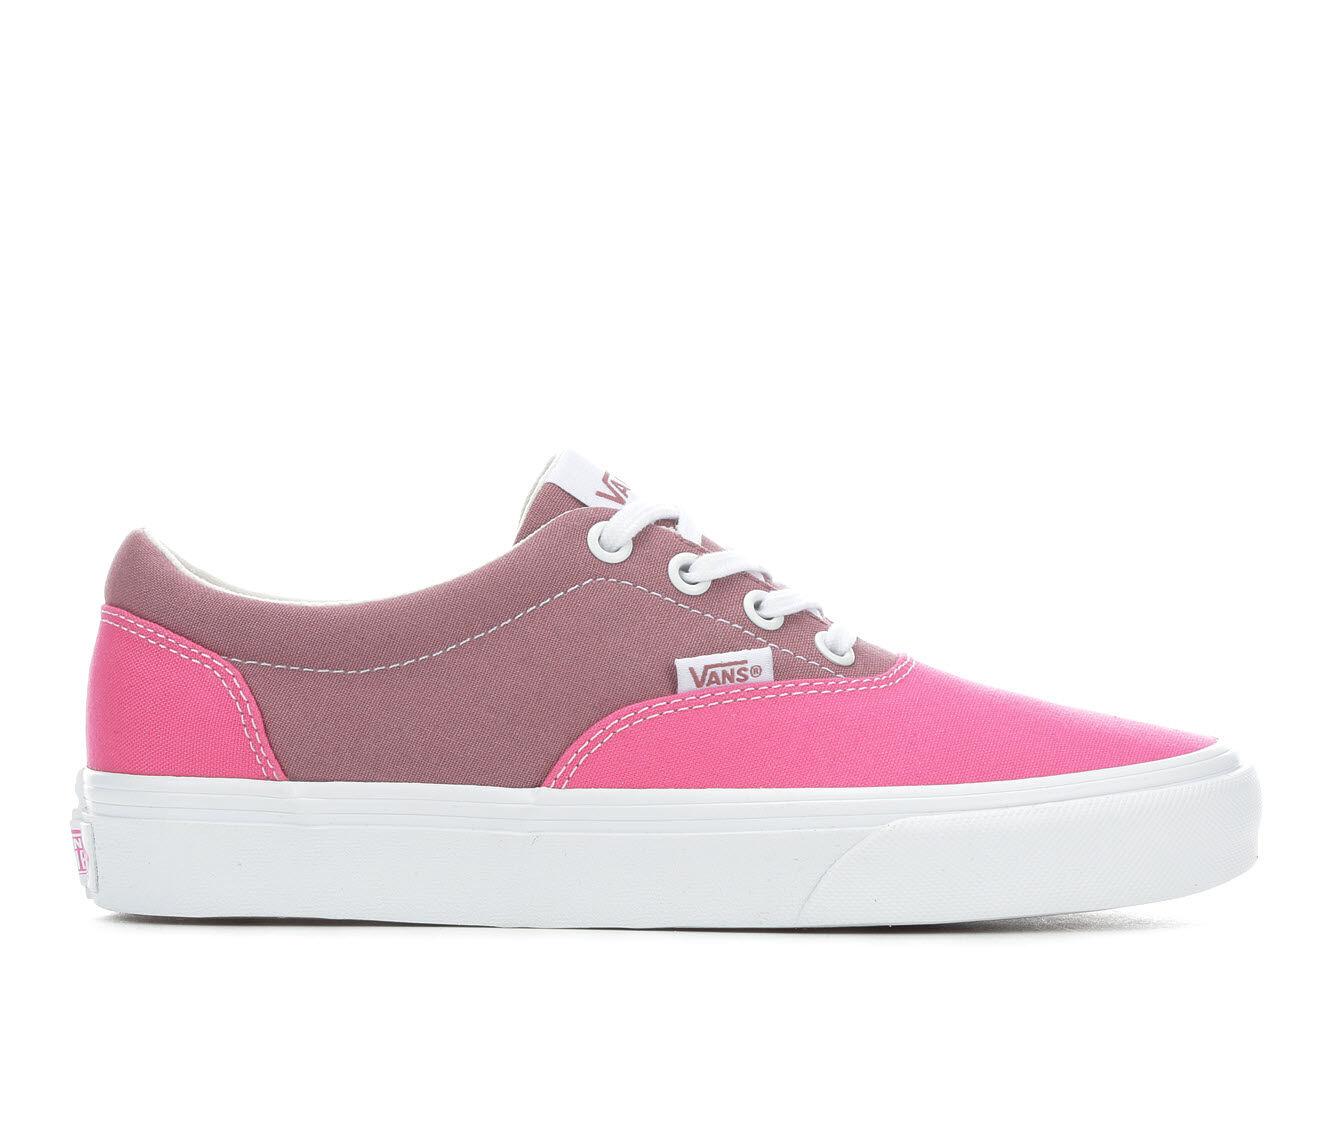 Women's Vans Doheny Two Tone Skate Shoes Azalea/Rose